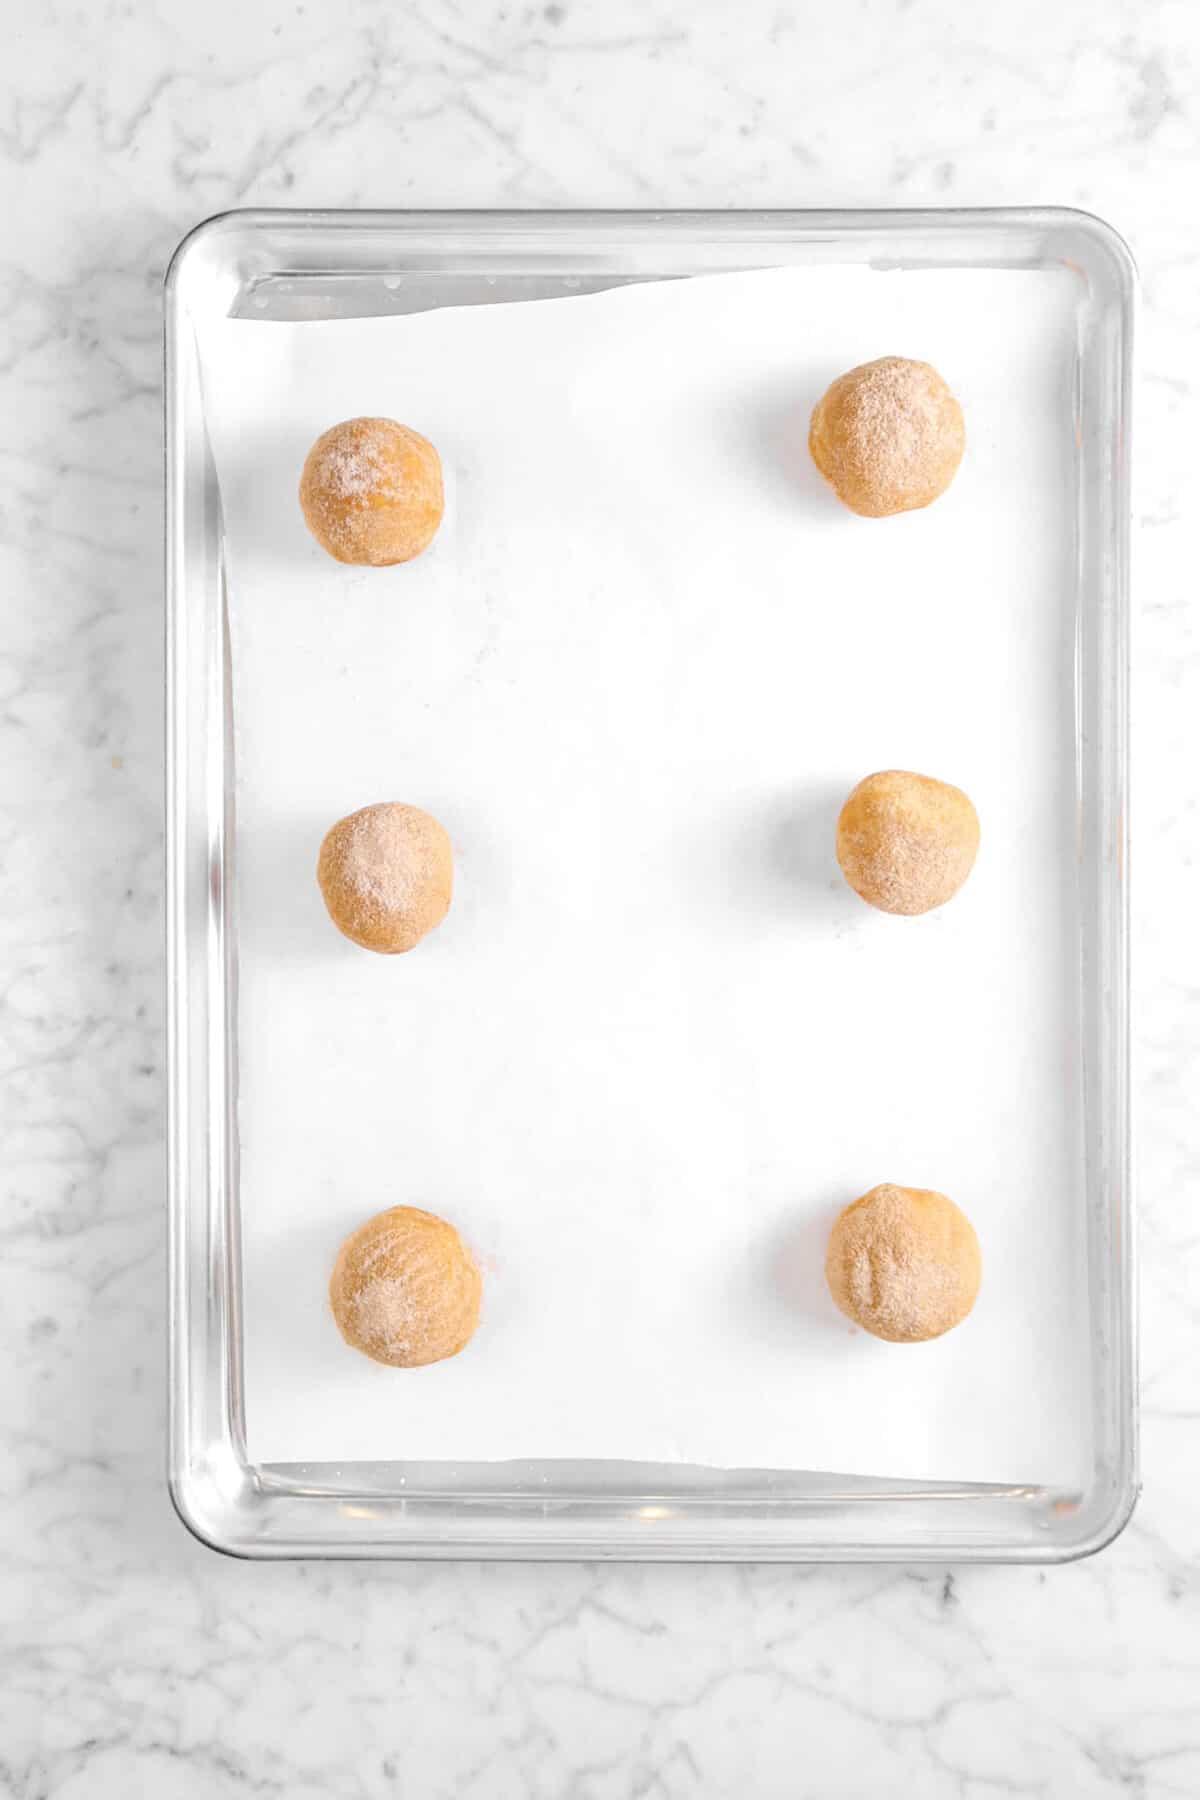 six cookie doughs on sheet pan